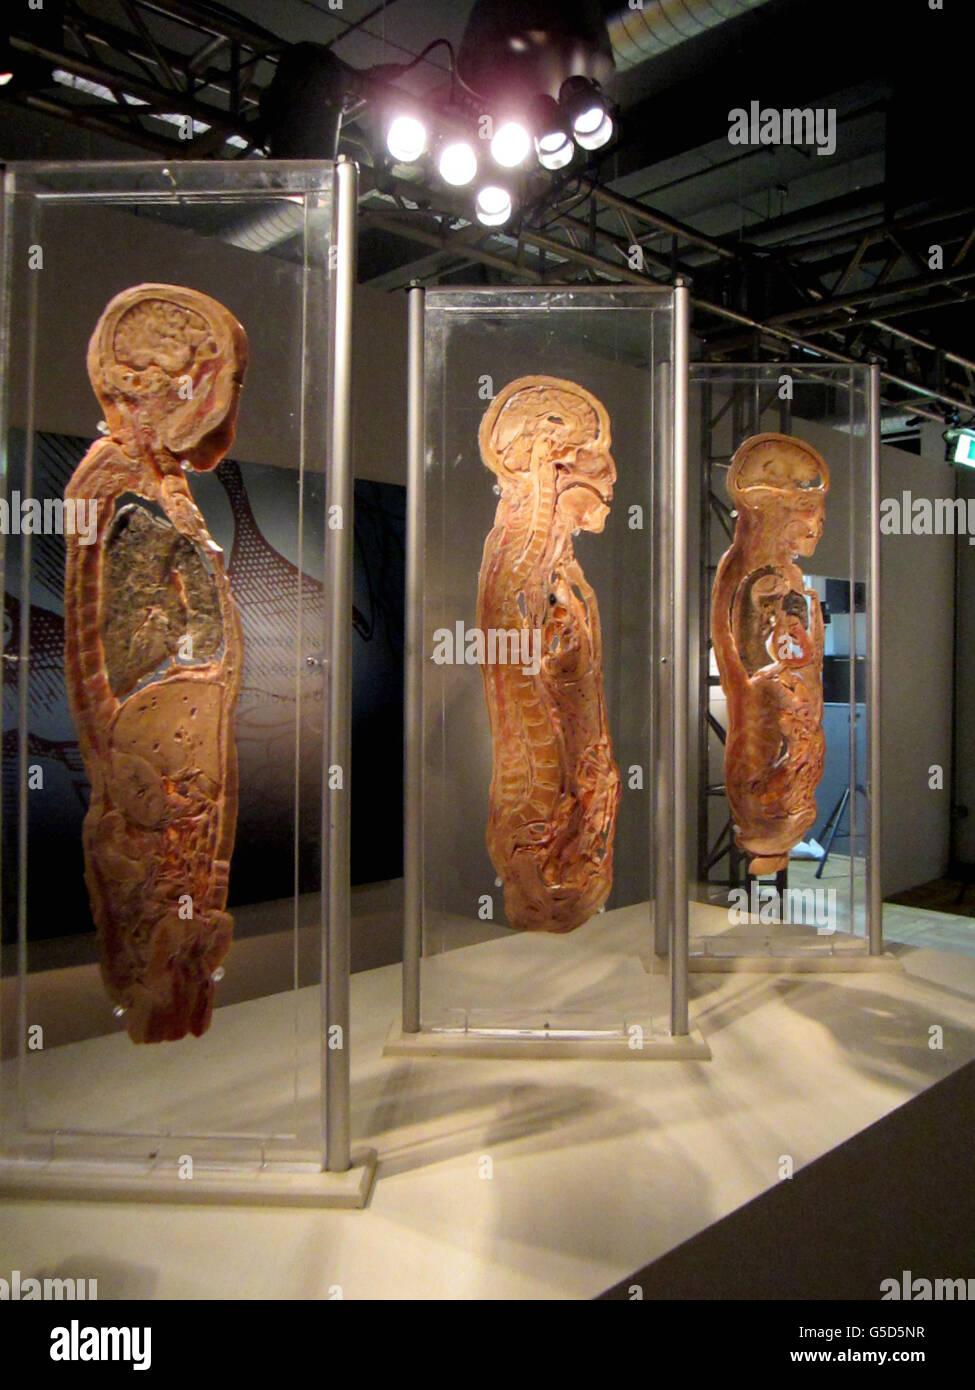 Bodies Revealed Exhibition Stock Photo Alamy